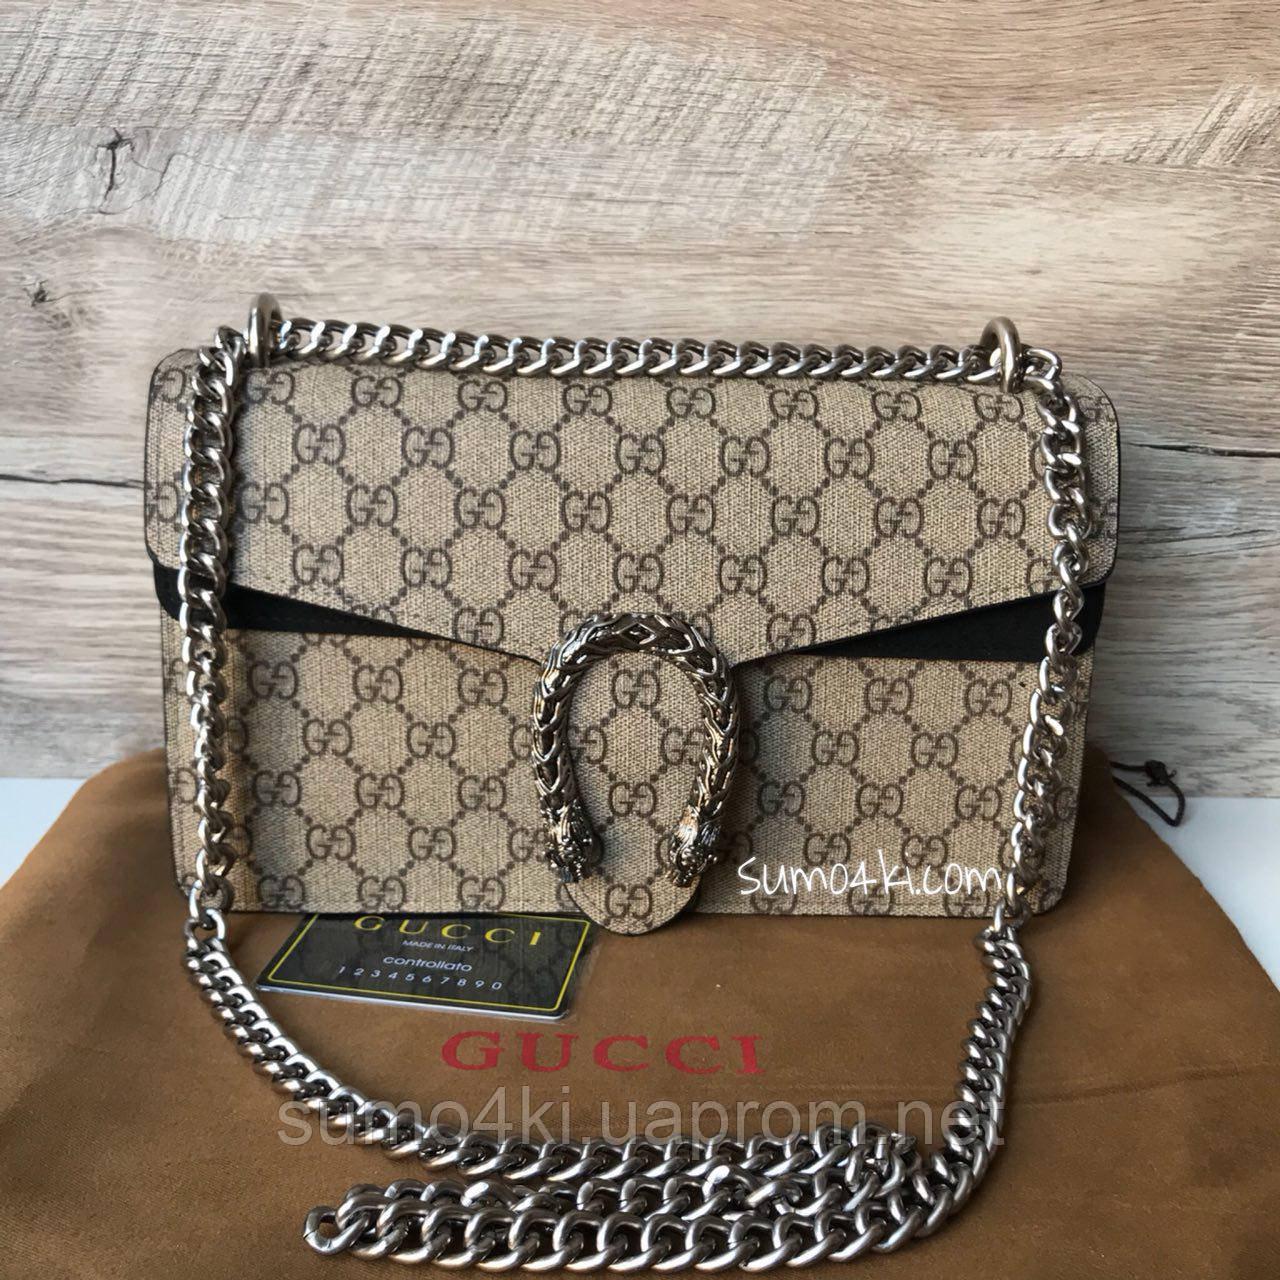 fa92fef8d16a Женская сумка Gucci Dionysus Гуччи - Интернет-магазин «Галерея Сумок» в  Одессе